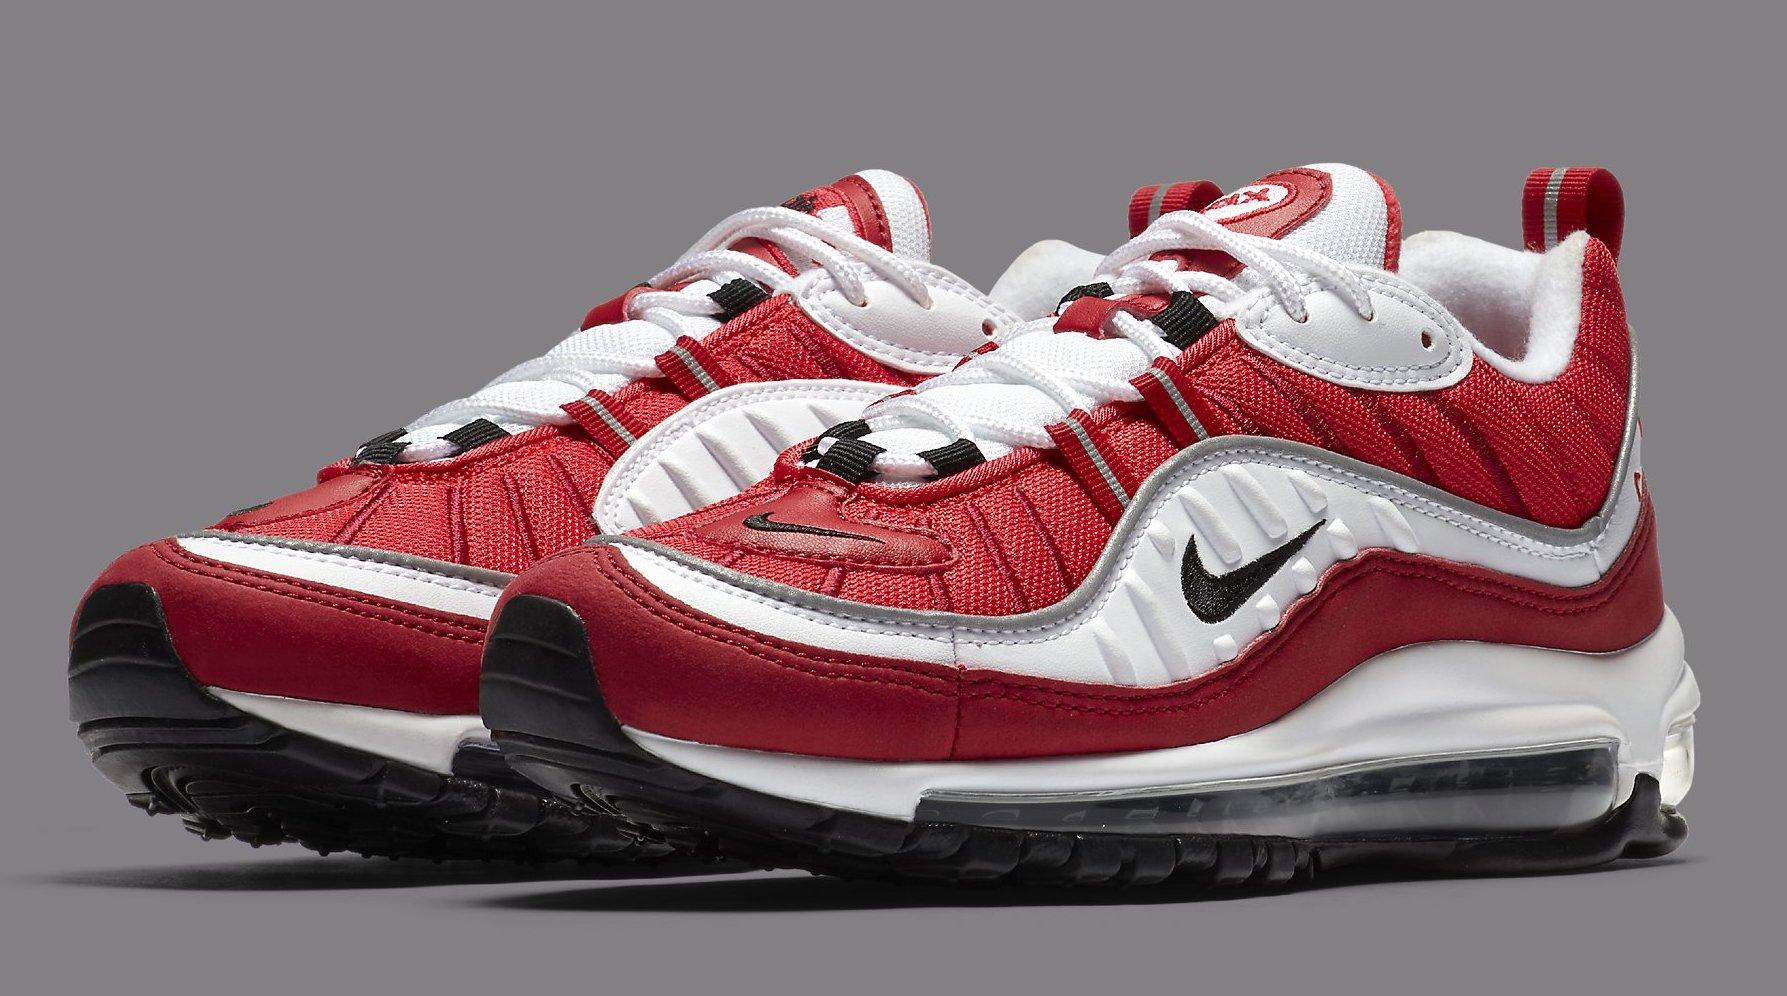 Nike Air Max 98 White/Black-Gym Red-Reflect Silver AH6799-101 ...